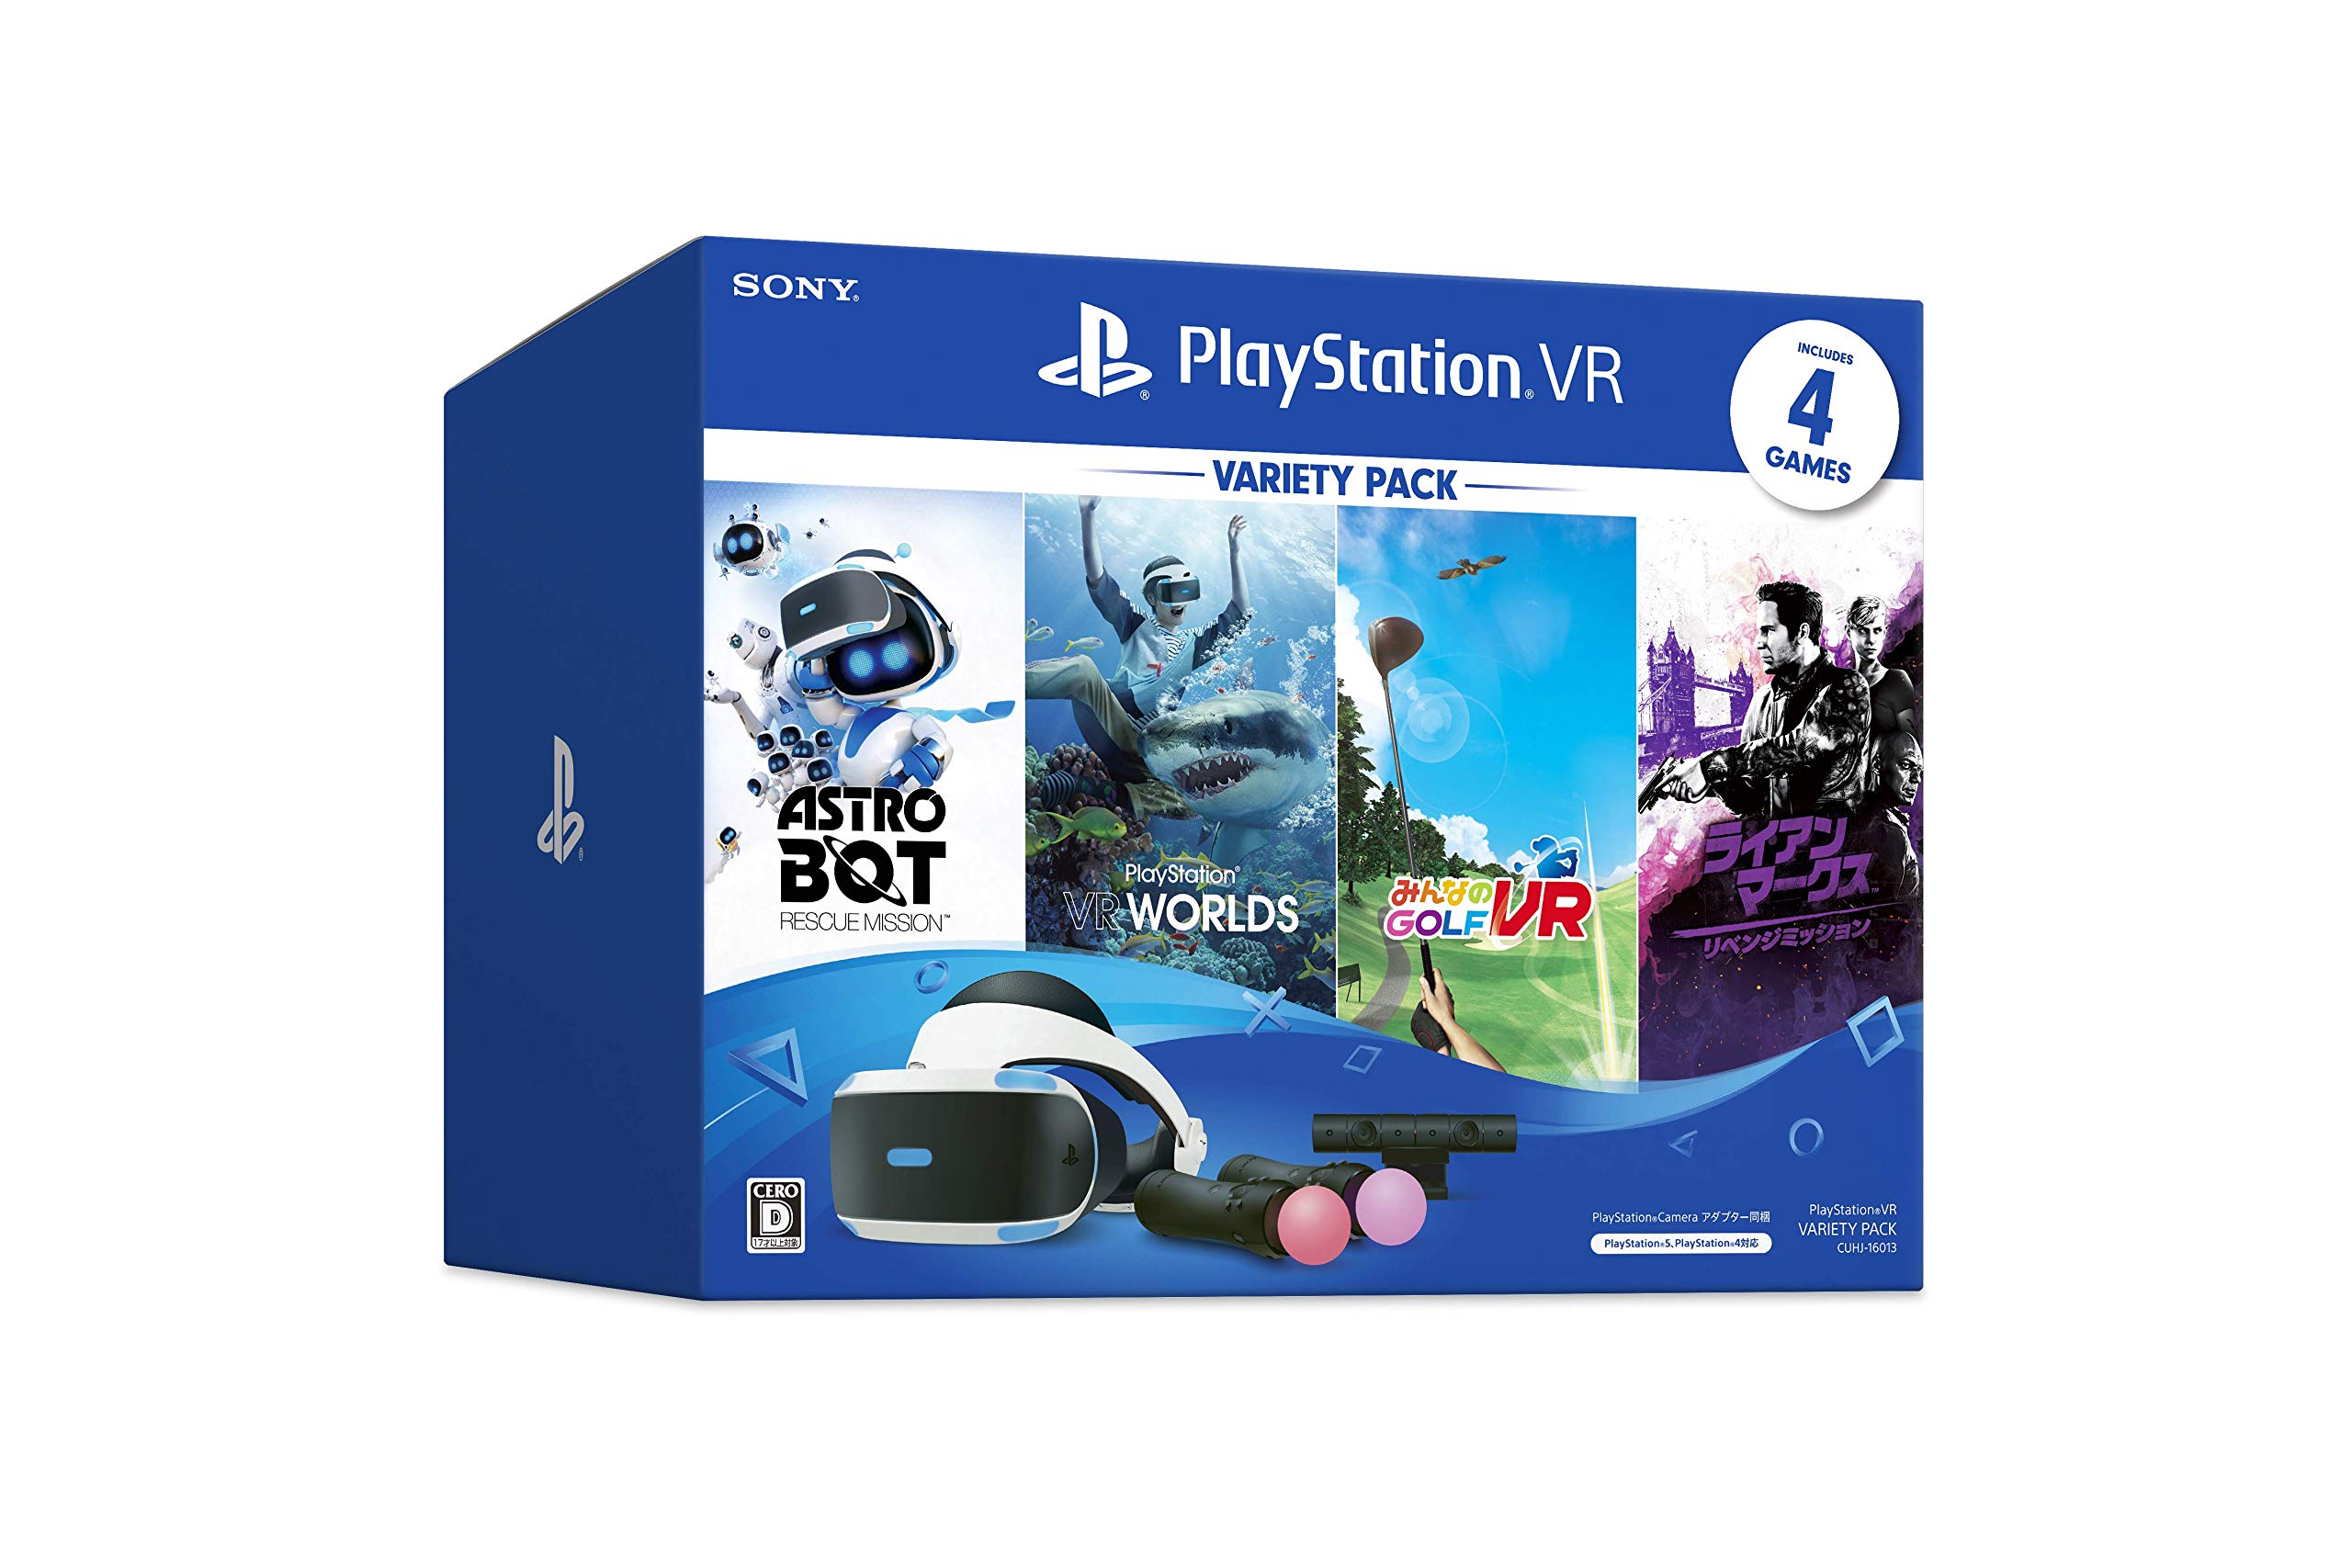 "数量限定「PlayStation VR Variety Pack」「PlayStation VR ""PlayStation VR WORLDS"" 特典封入版」発売!15,000円以上お得!【10月29日発売!】"